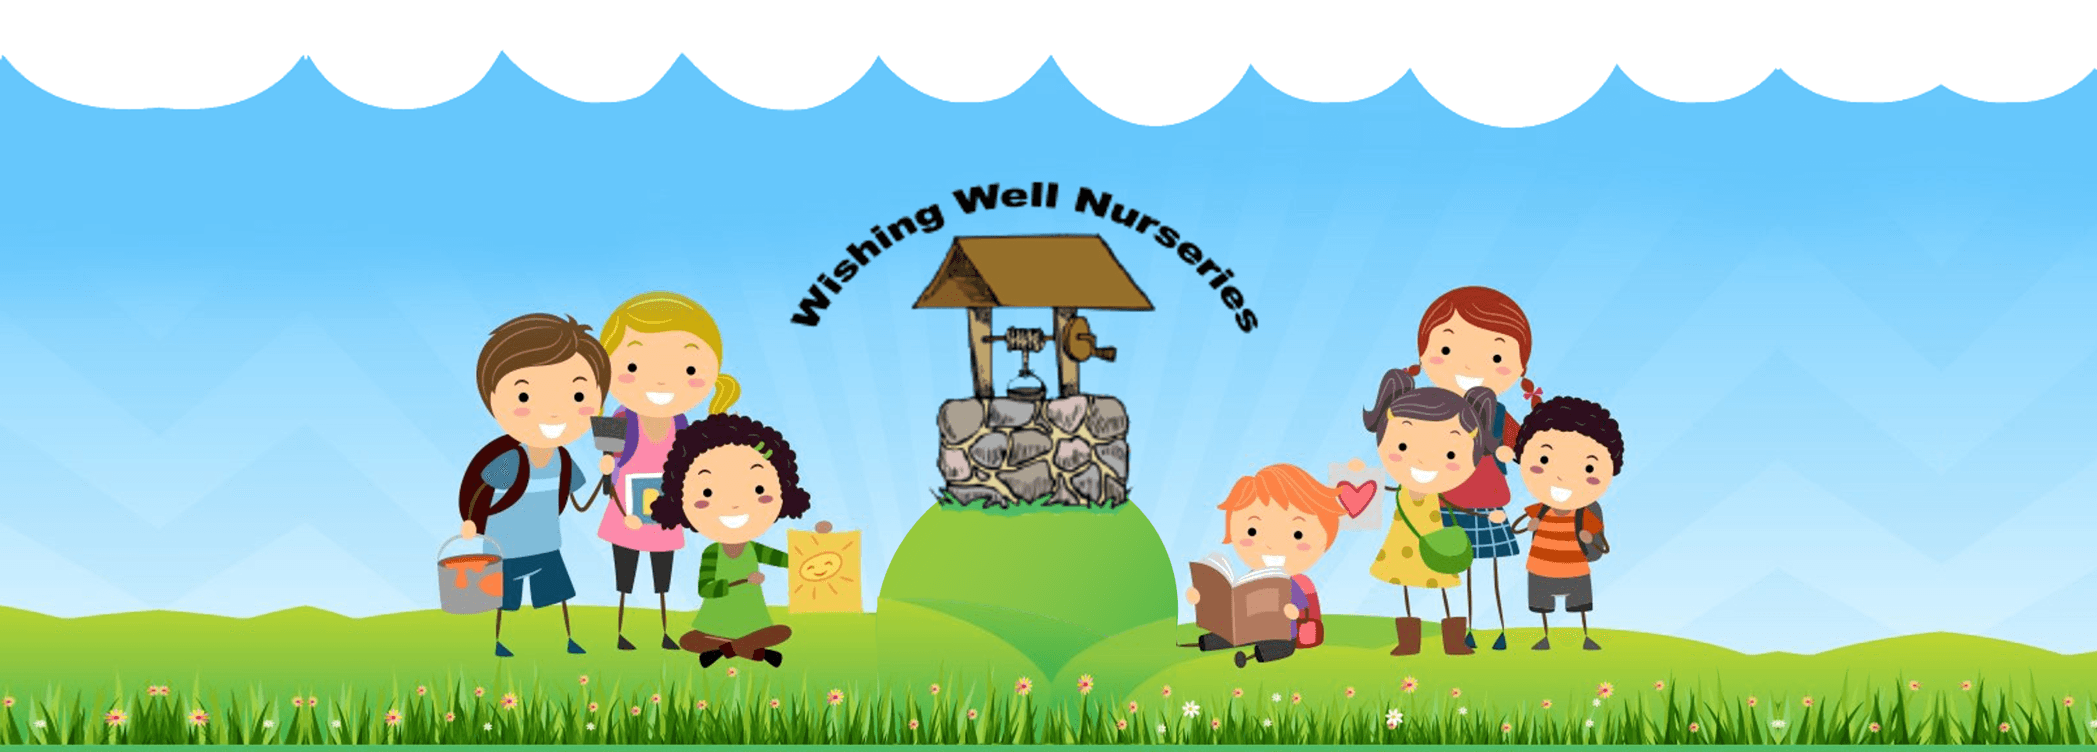 Wishing Well Nurseries logo